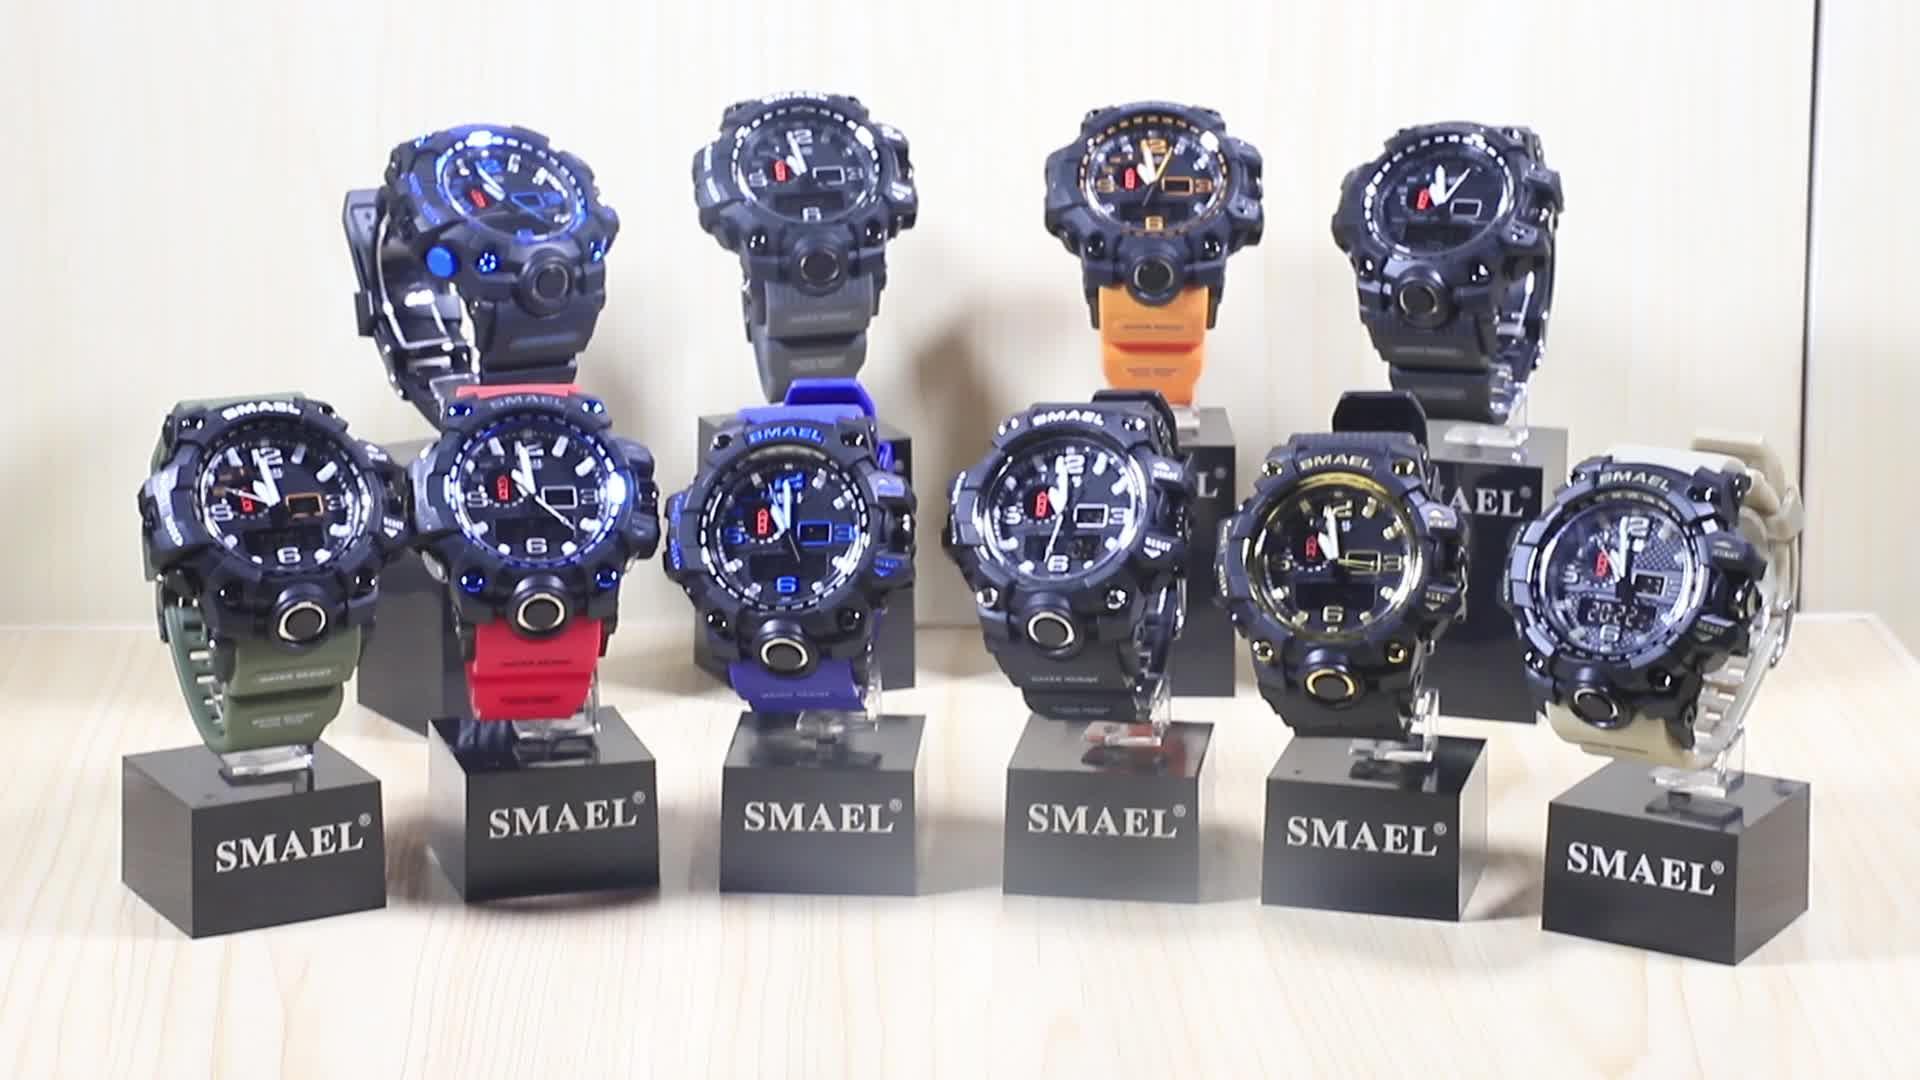 SMAEL ผู้ผลิตออนไลน์ขายส่ง 1545 กลางแจ้งกันน้ำ dual time mens กีฬานาฬิกา